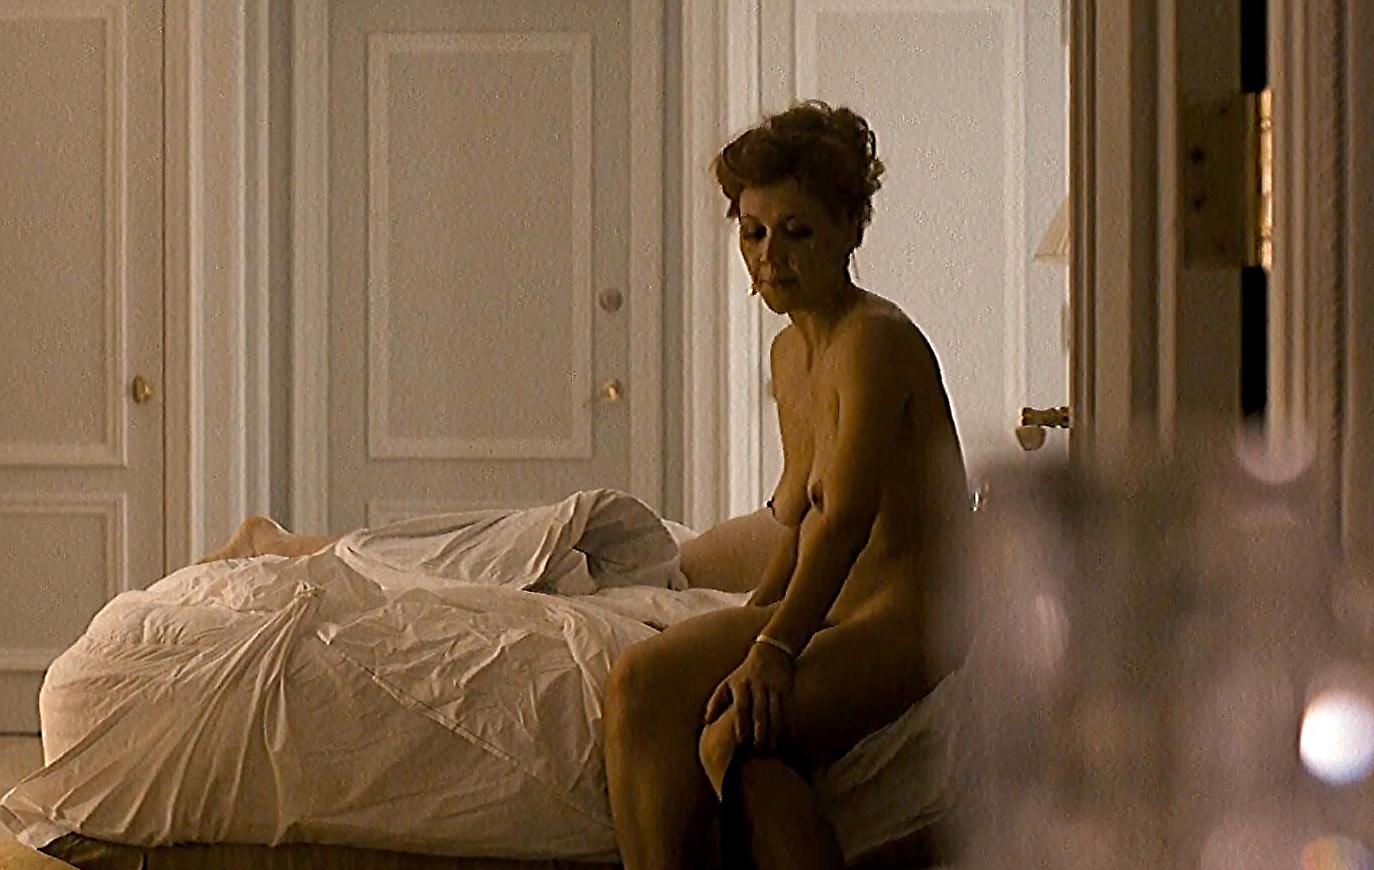 Reserve maggie gyllenhaal nude pictures